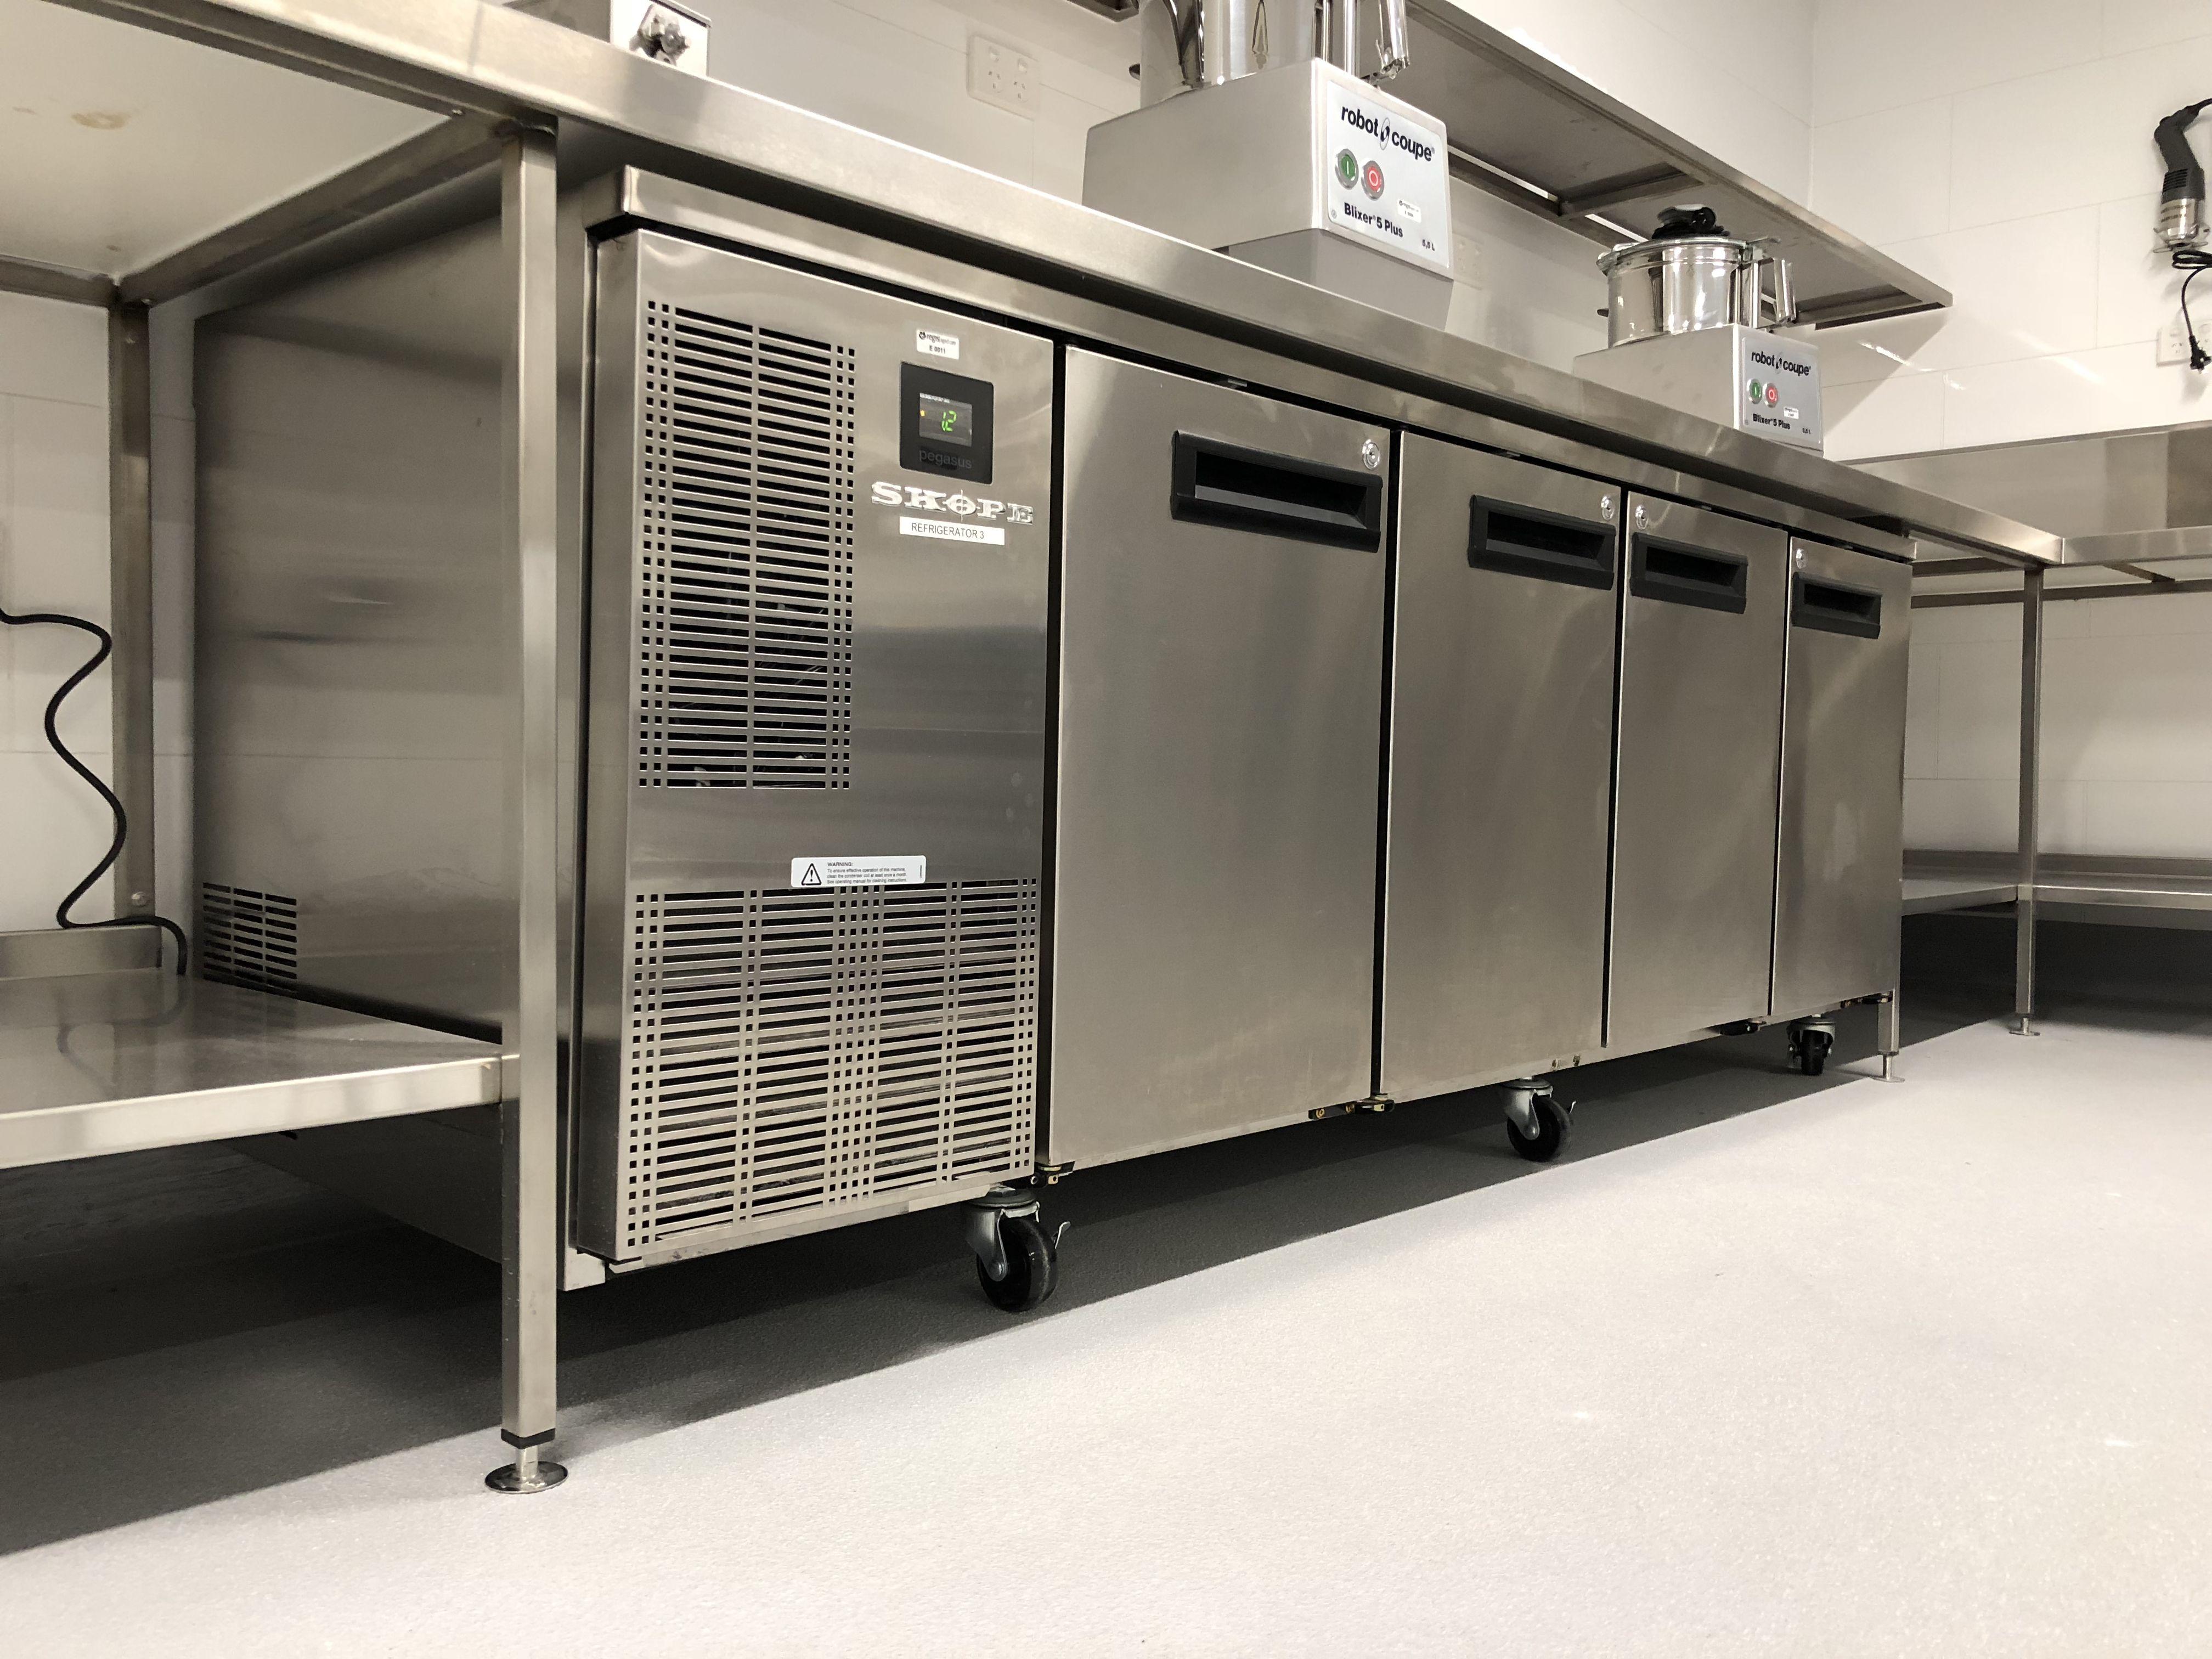 Skope Refrigeration Regis Aged Care Elermore Vale Newcastle Newcastleagecare Skoperefrigeration Alwaysskope Skopeprojects Commercial Kitchen Equipment